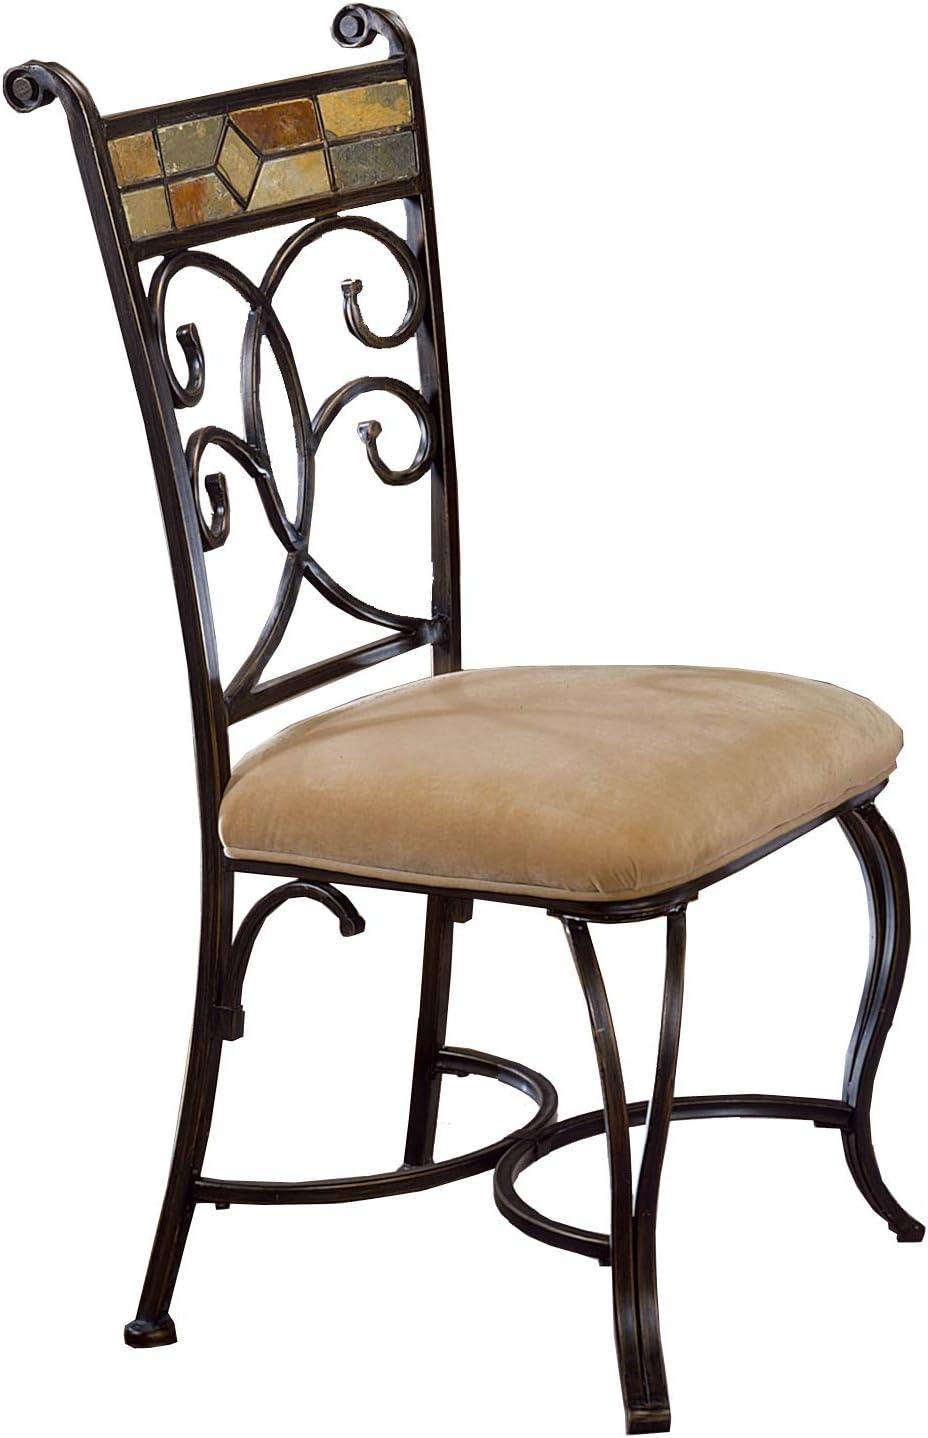 Hillsdale Furniture Dining Chair Set, Black Gold/Slate Mosaic